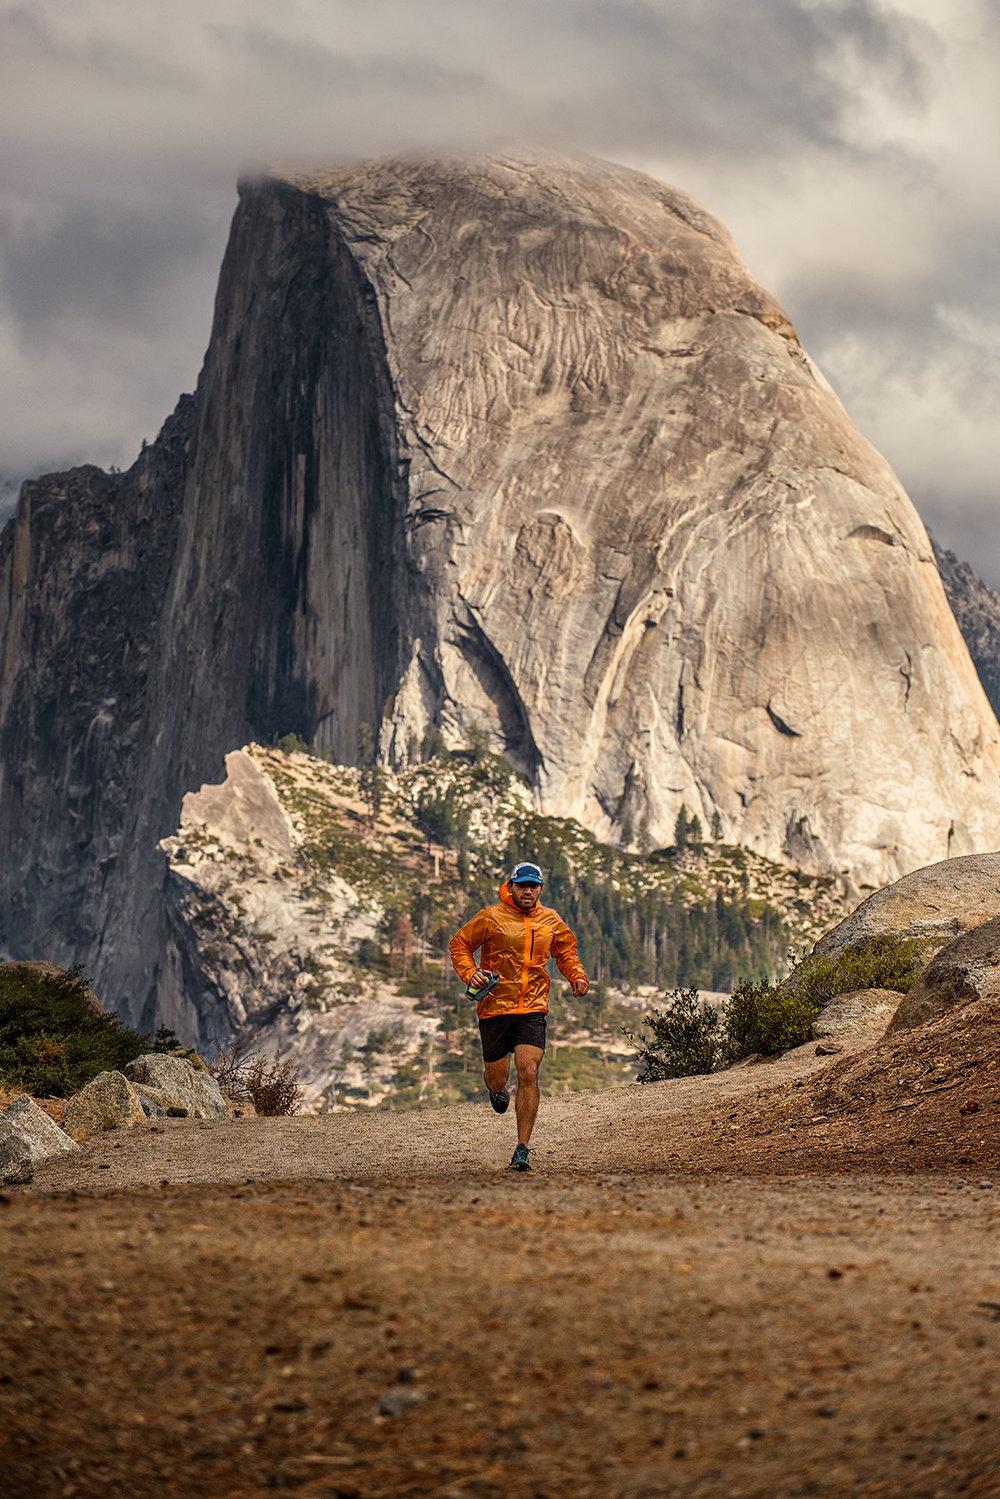 austin-trigg-yosemite-national-park-trail-running-run-half-domw-glacier-point-clouds-sunset-california-adventure.jpg